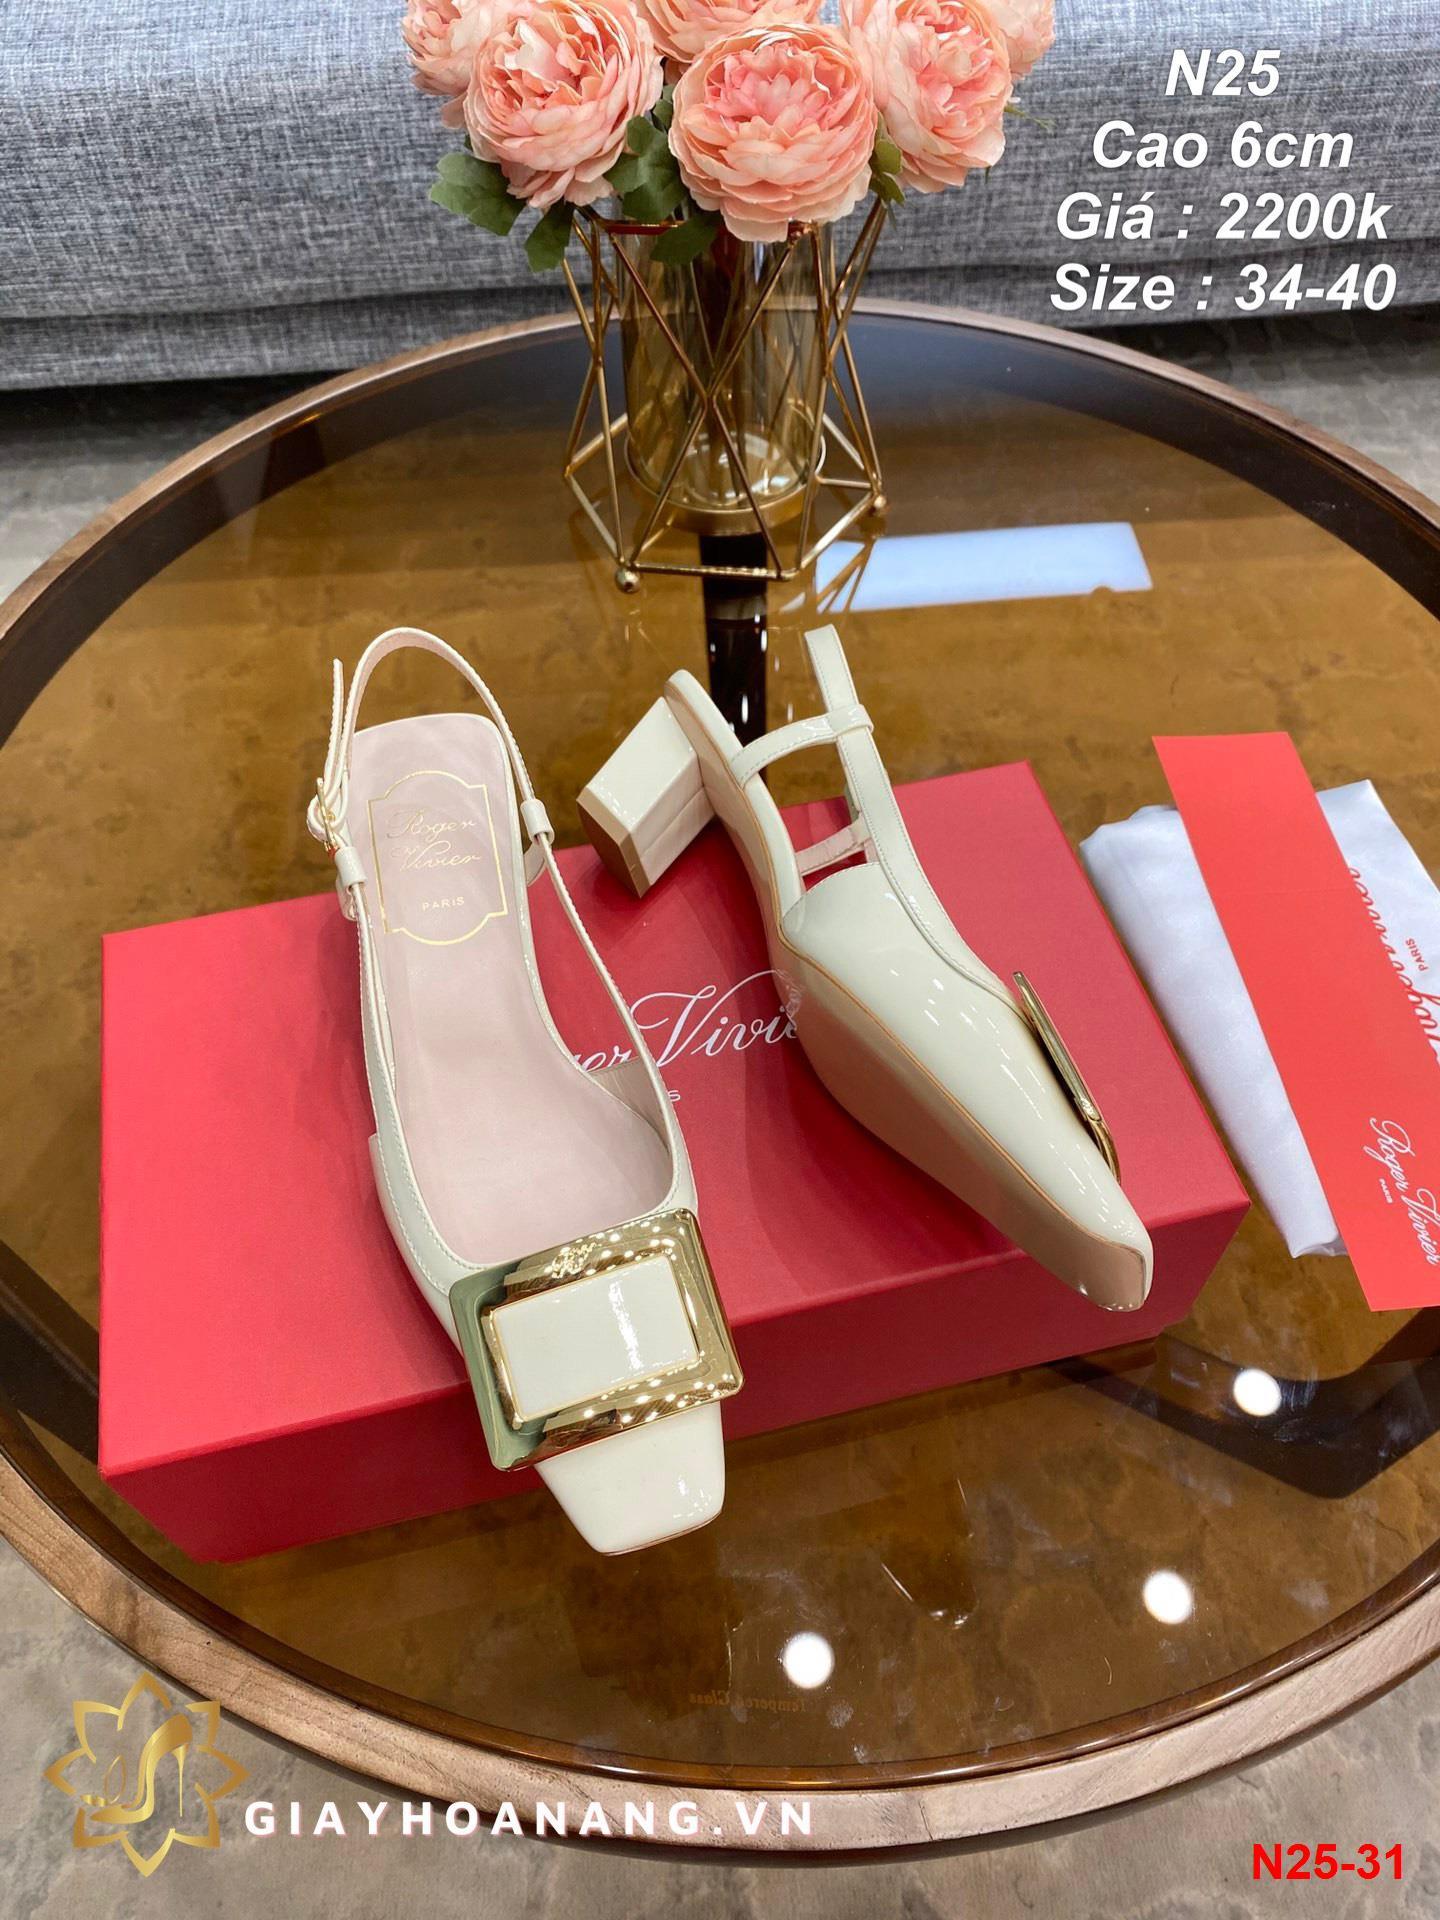 N25-31 Roger Vivier sandal cao 6cm siêu cấp